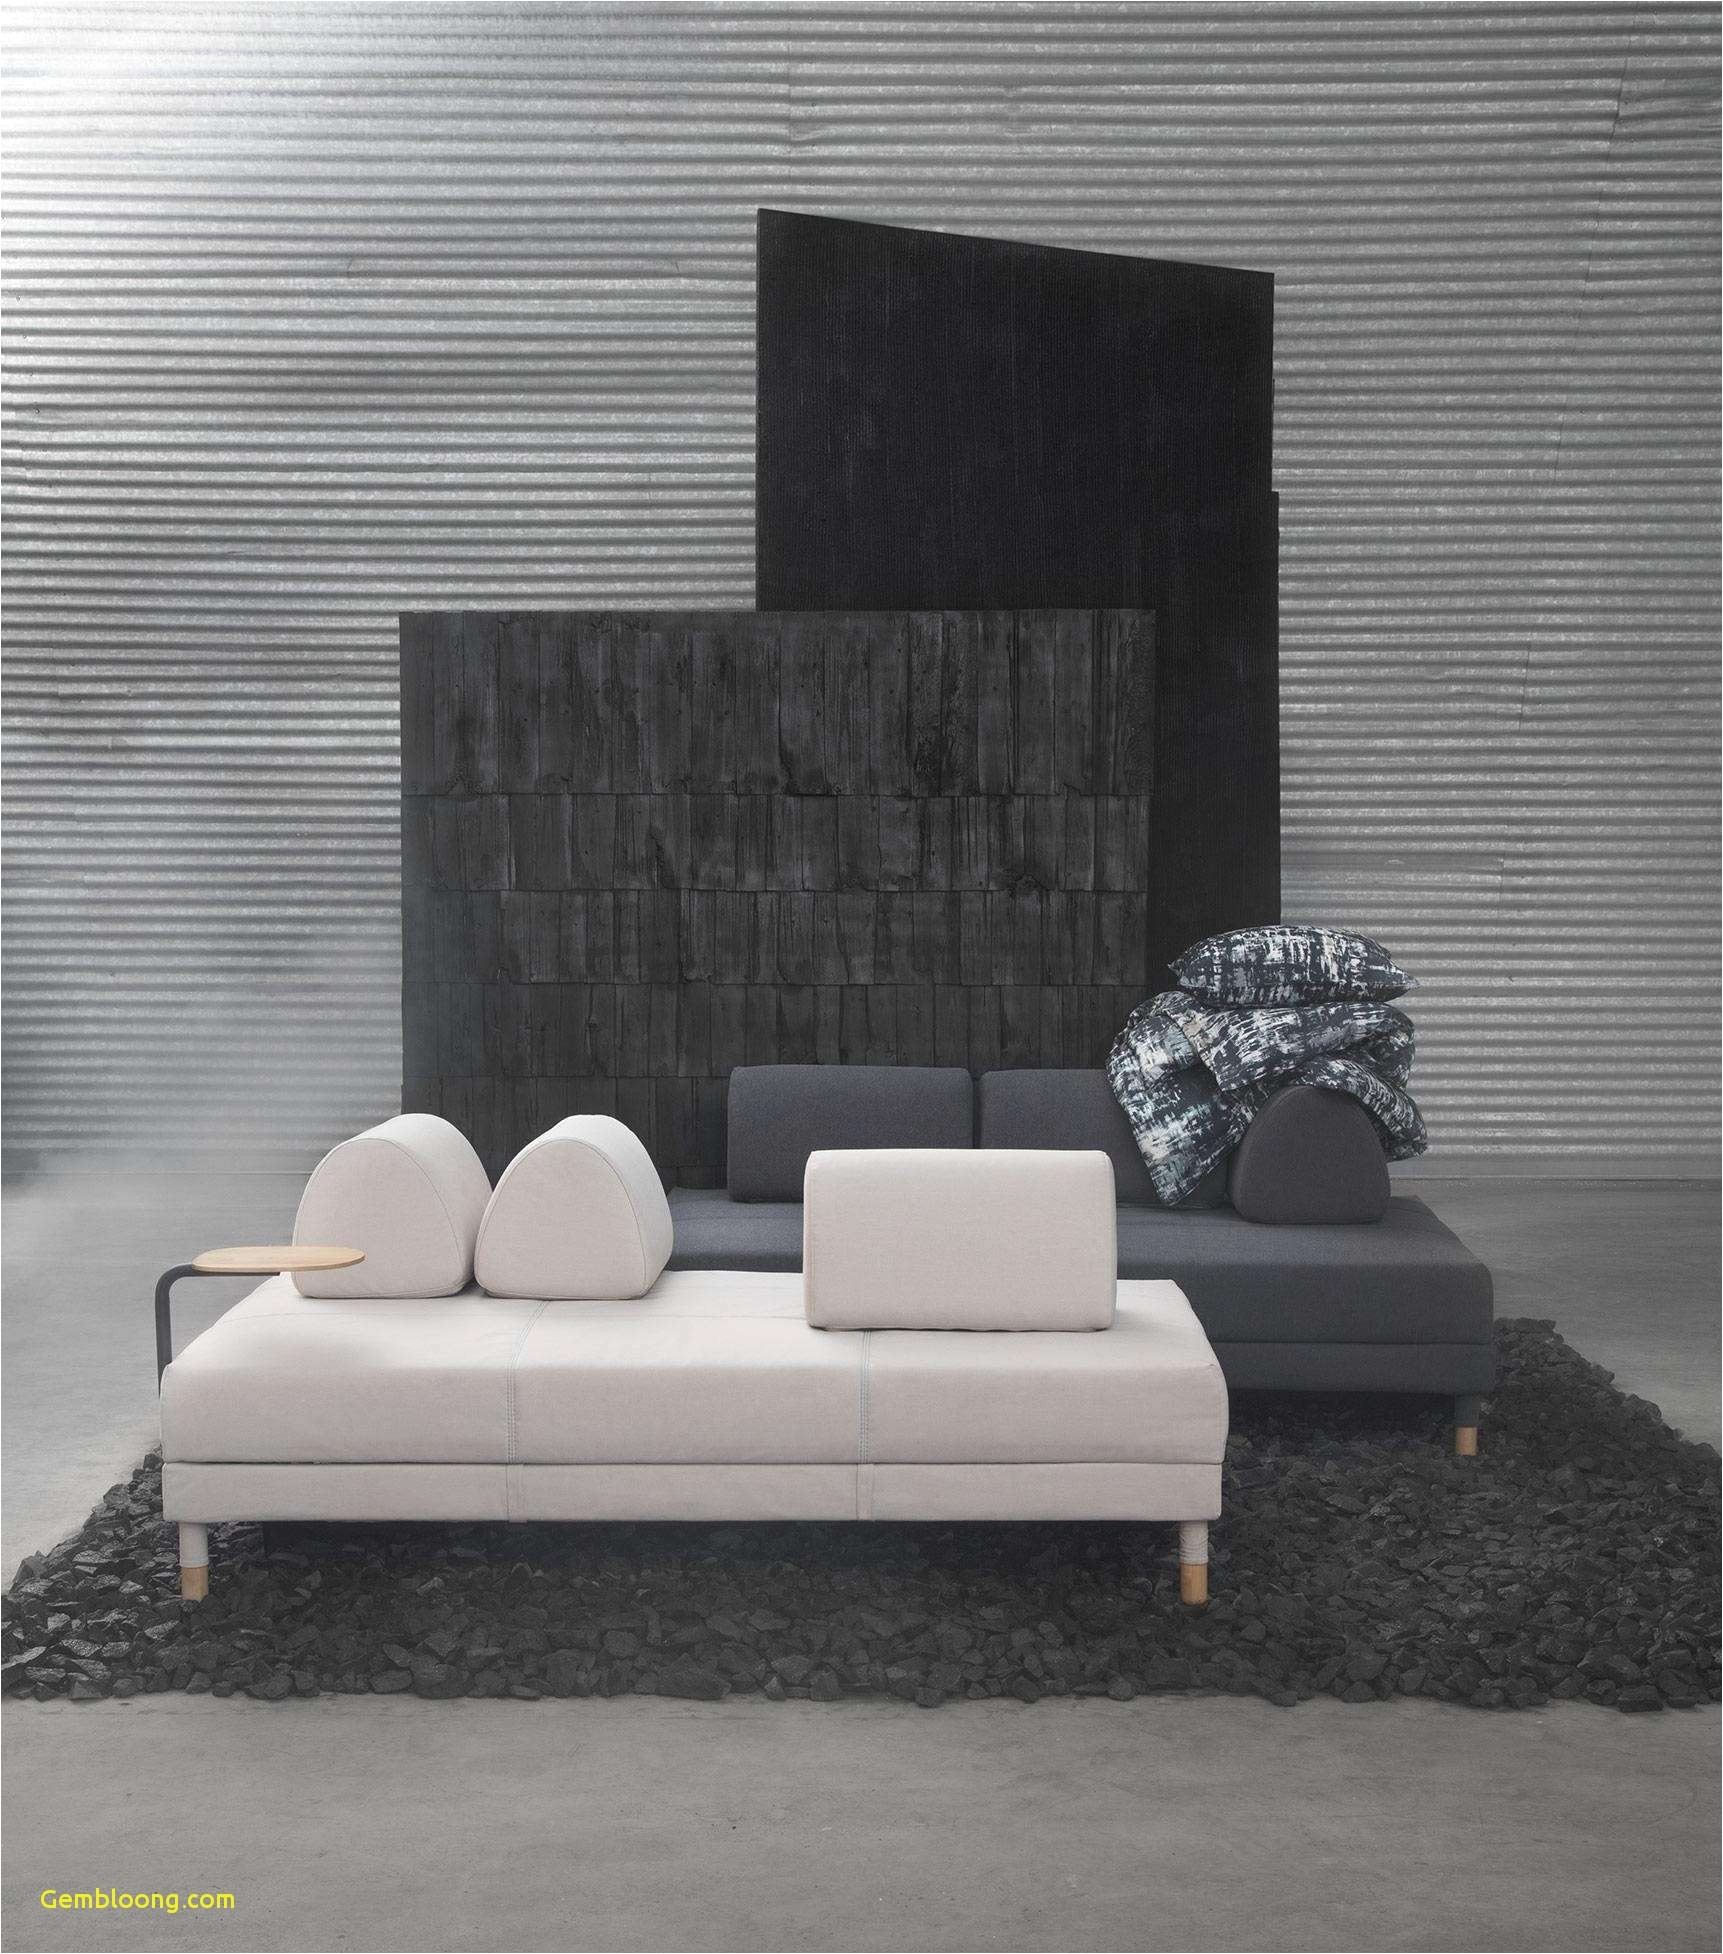 Stunning Black White Living Room Design Ideas Awesome Ikea Small Home Plans Inspirational Ikea Bathroom 0d